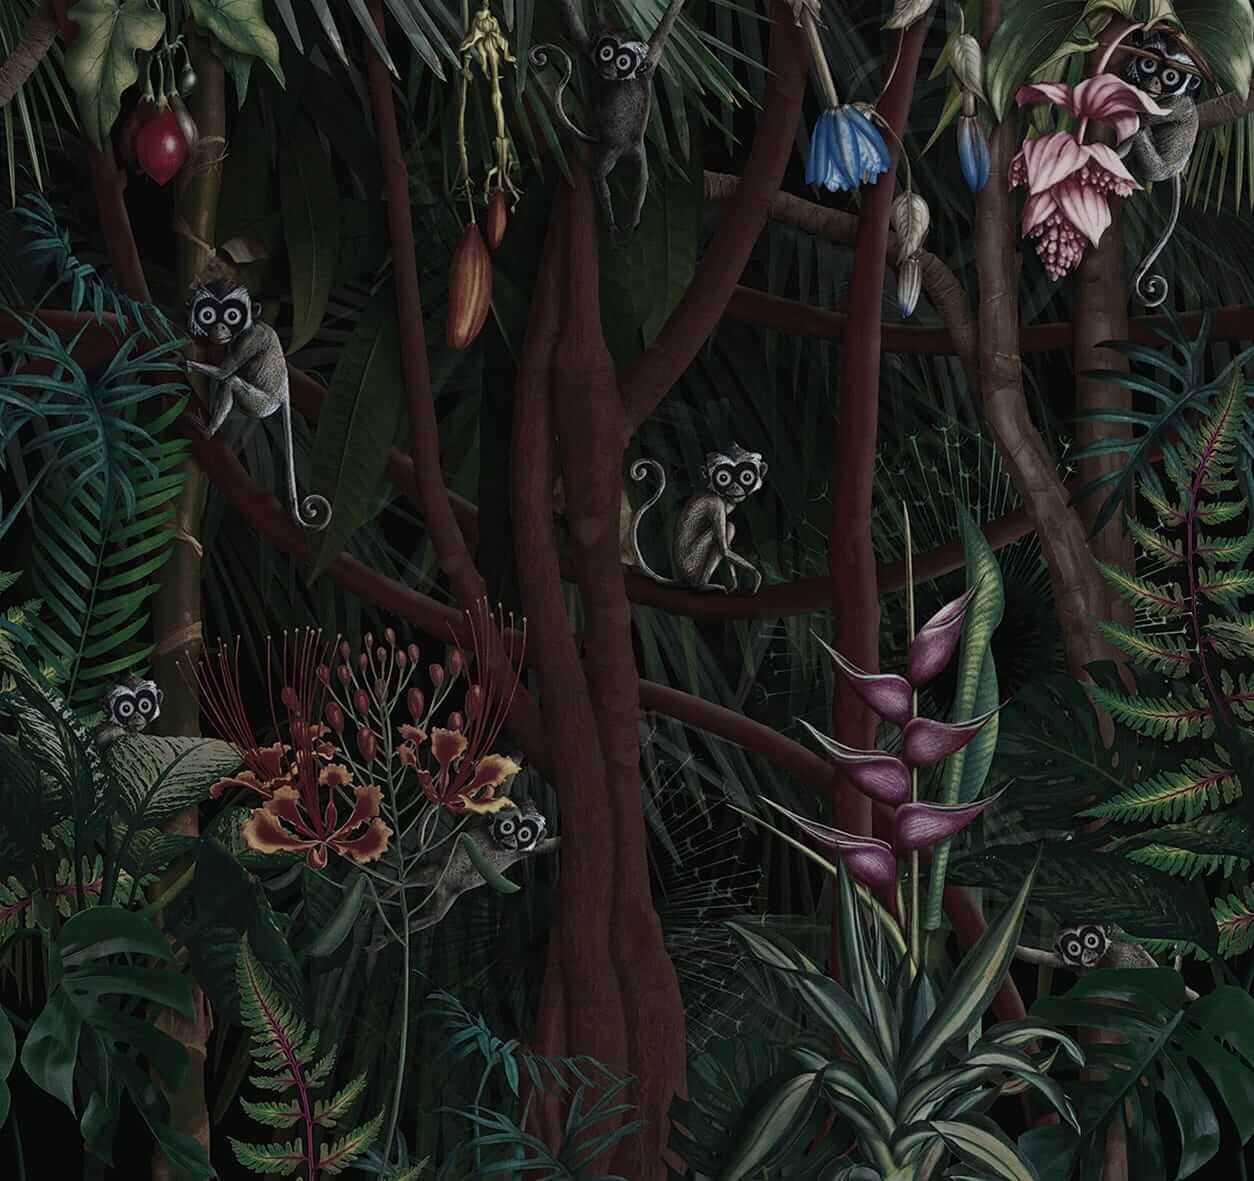 Tapeta dżungla pod prysznic LondonArt Looks in the forest